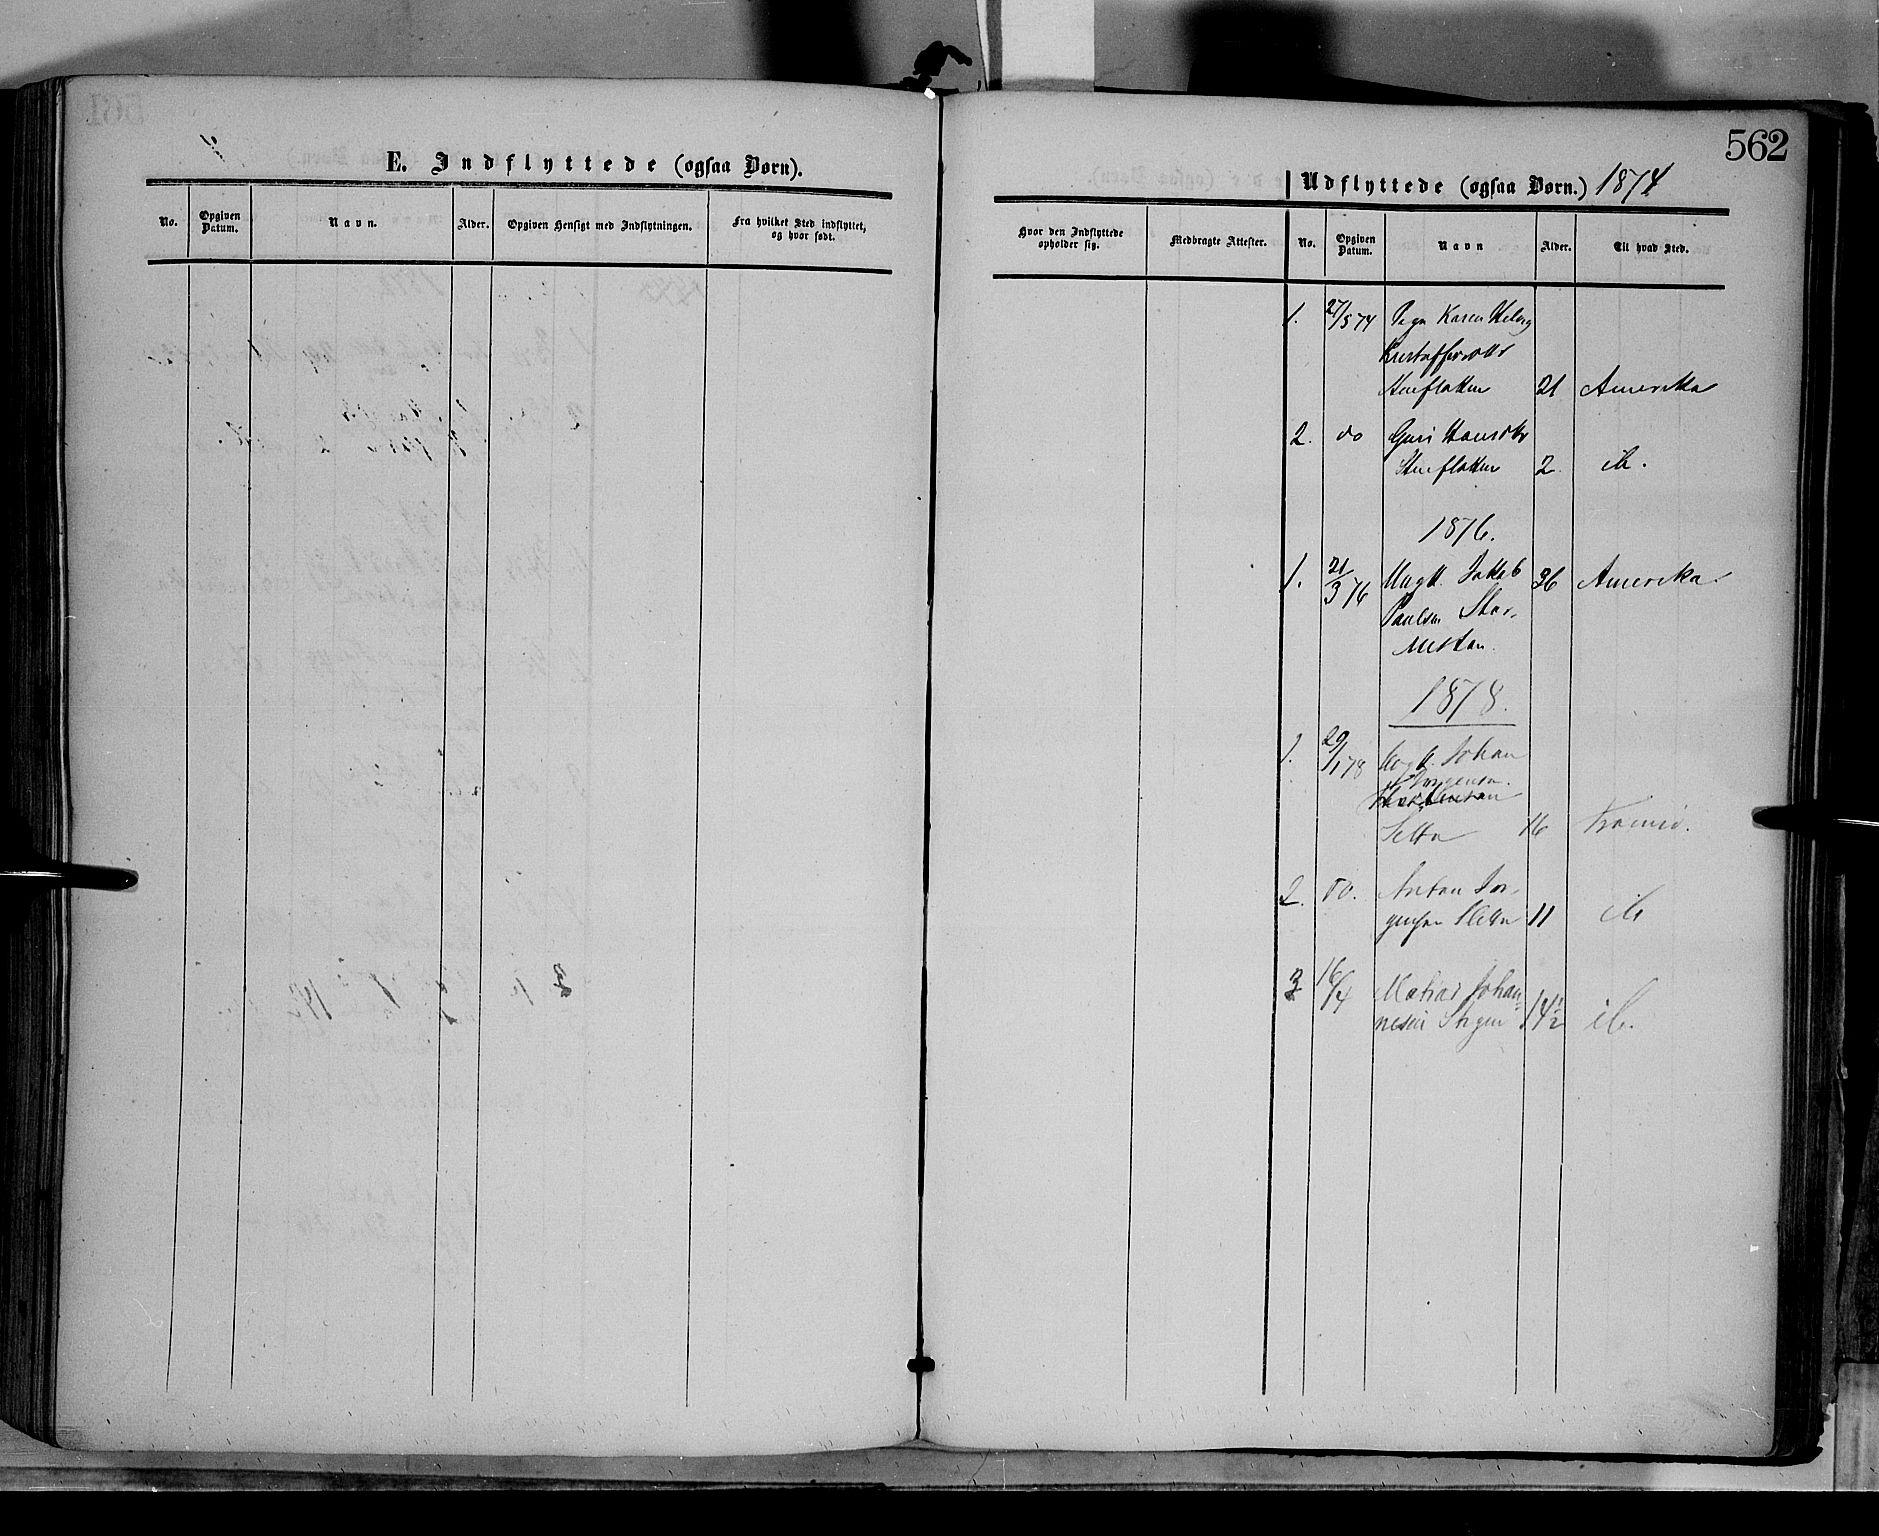 SAH, Dovre prestekontor, Ministerialbok nr. 1, 1854-1878, s. 562